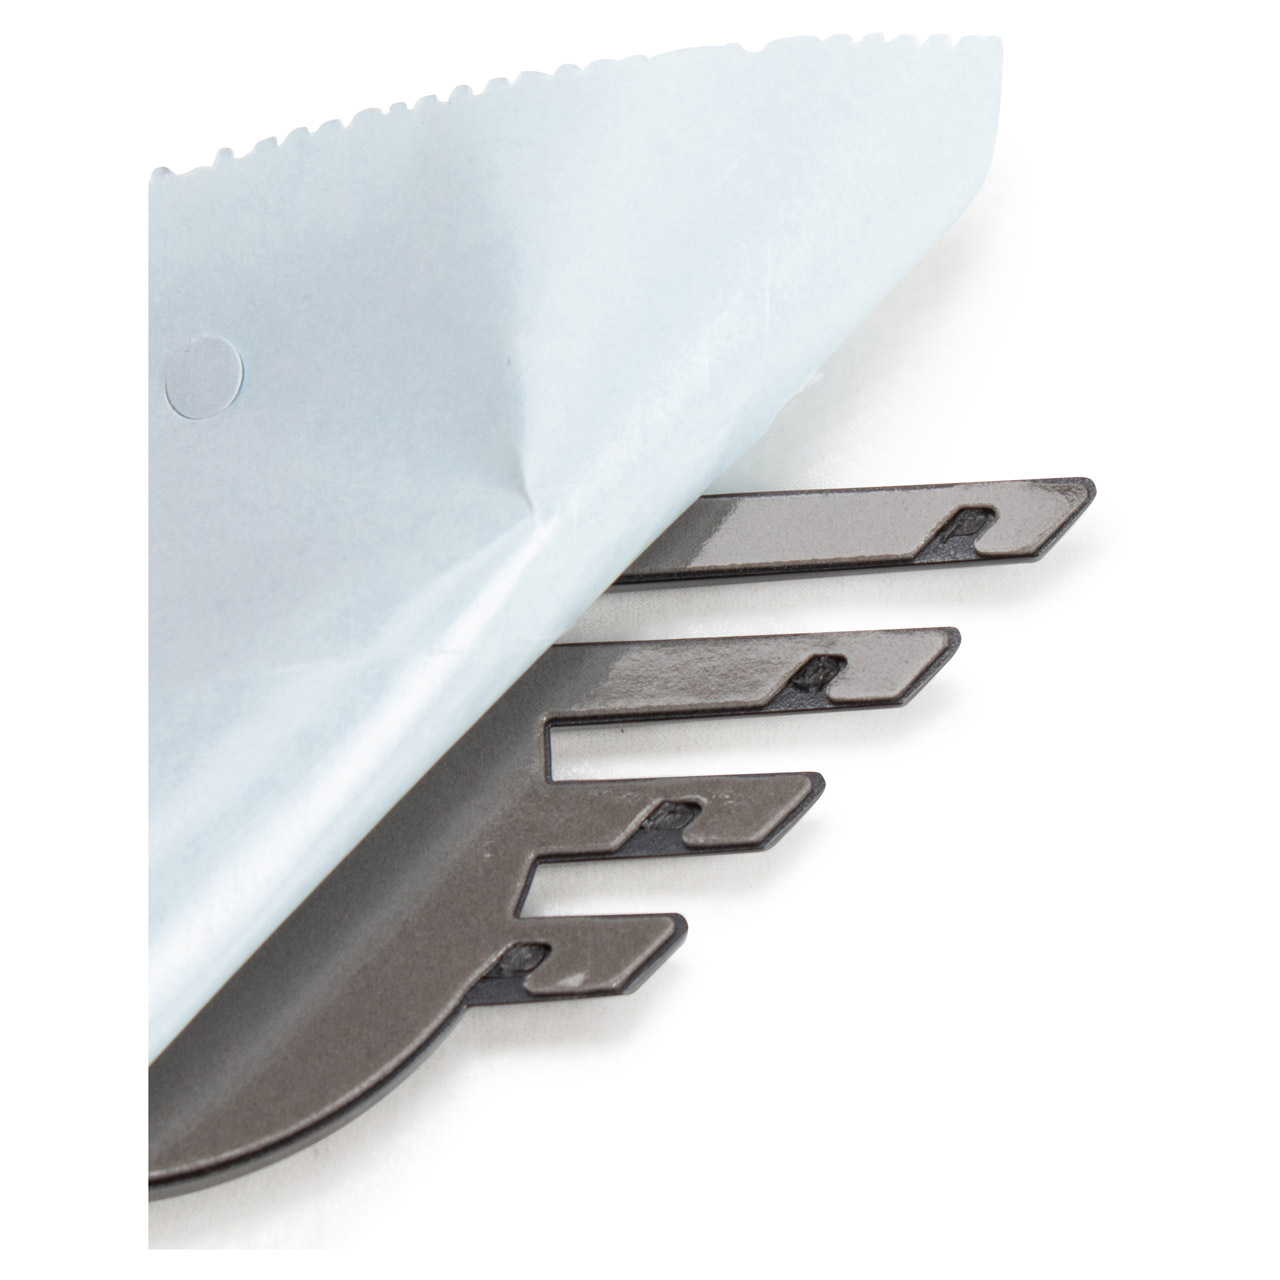 ORIGINAL Mini Emblem Plakette Logo Heckklappe F55 F56 F57 ab 03.2018 51142465242